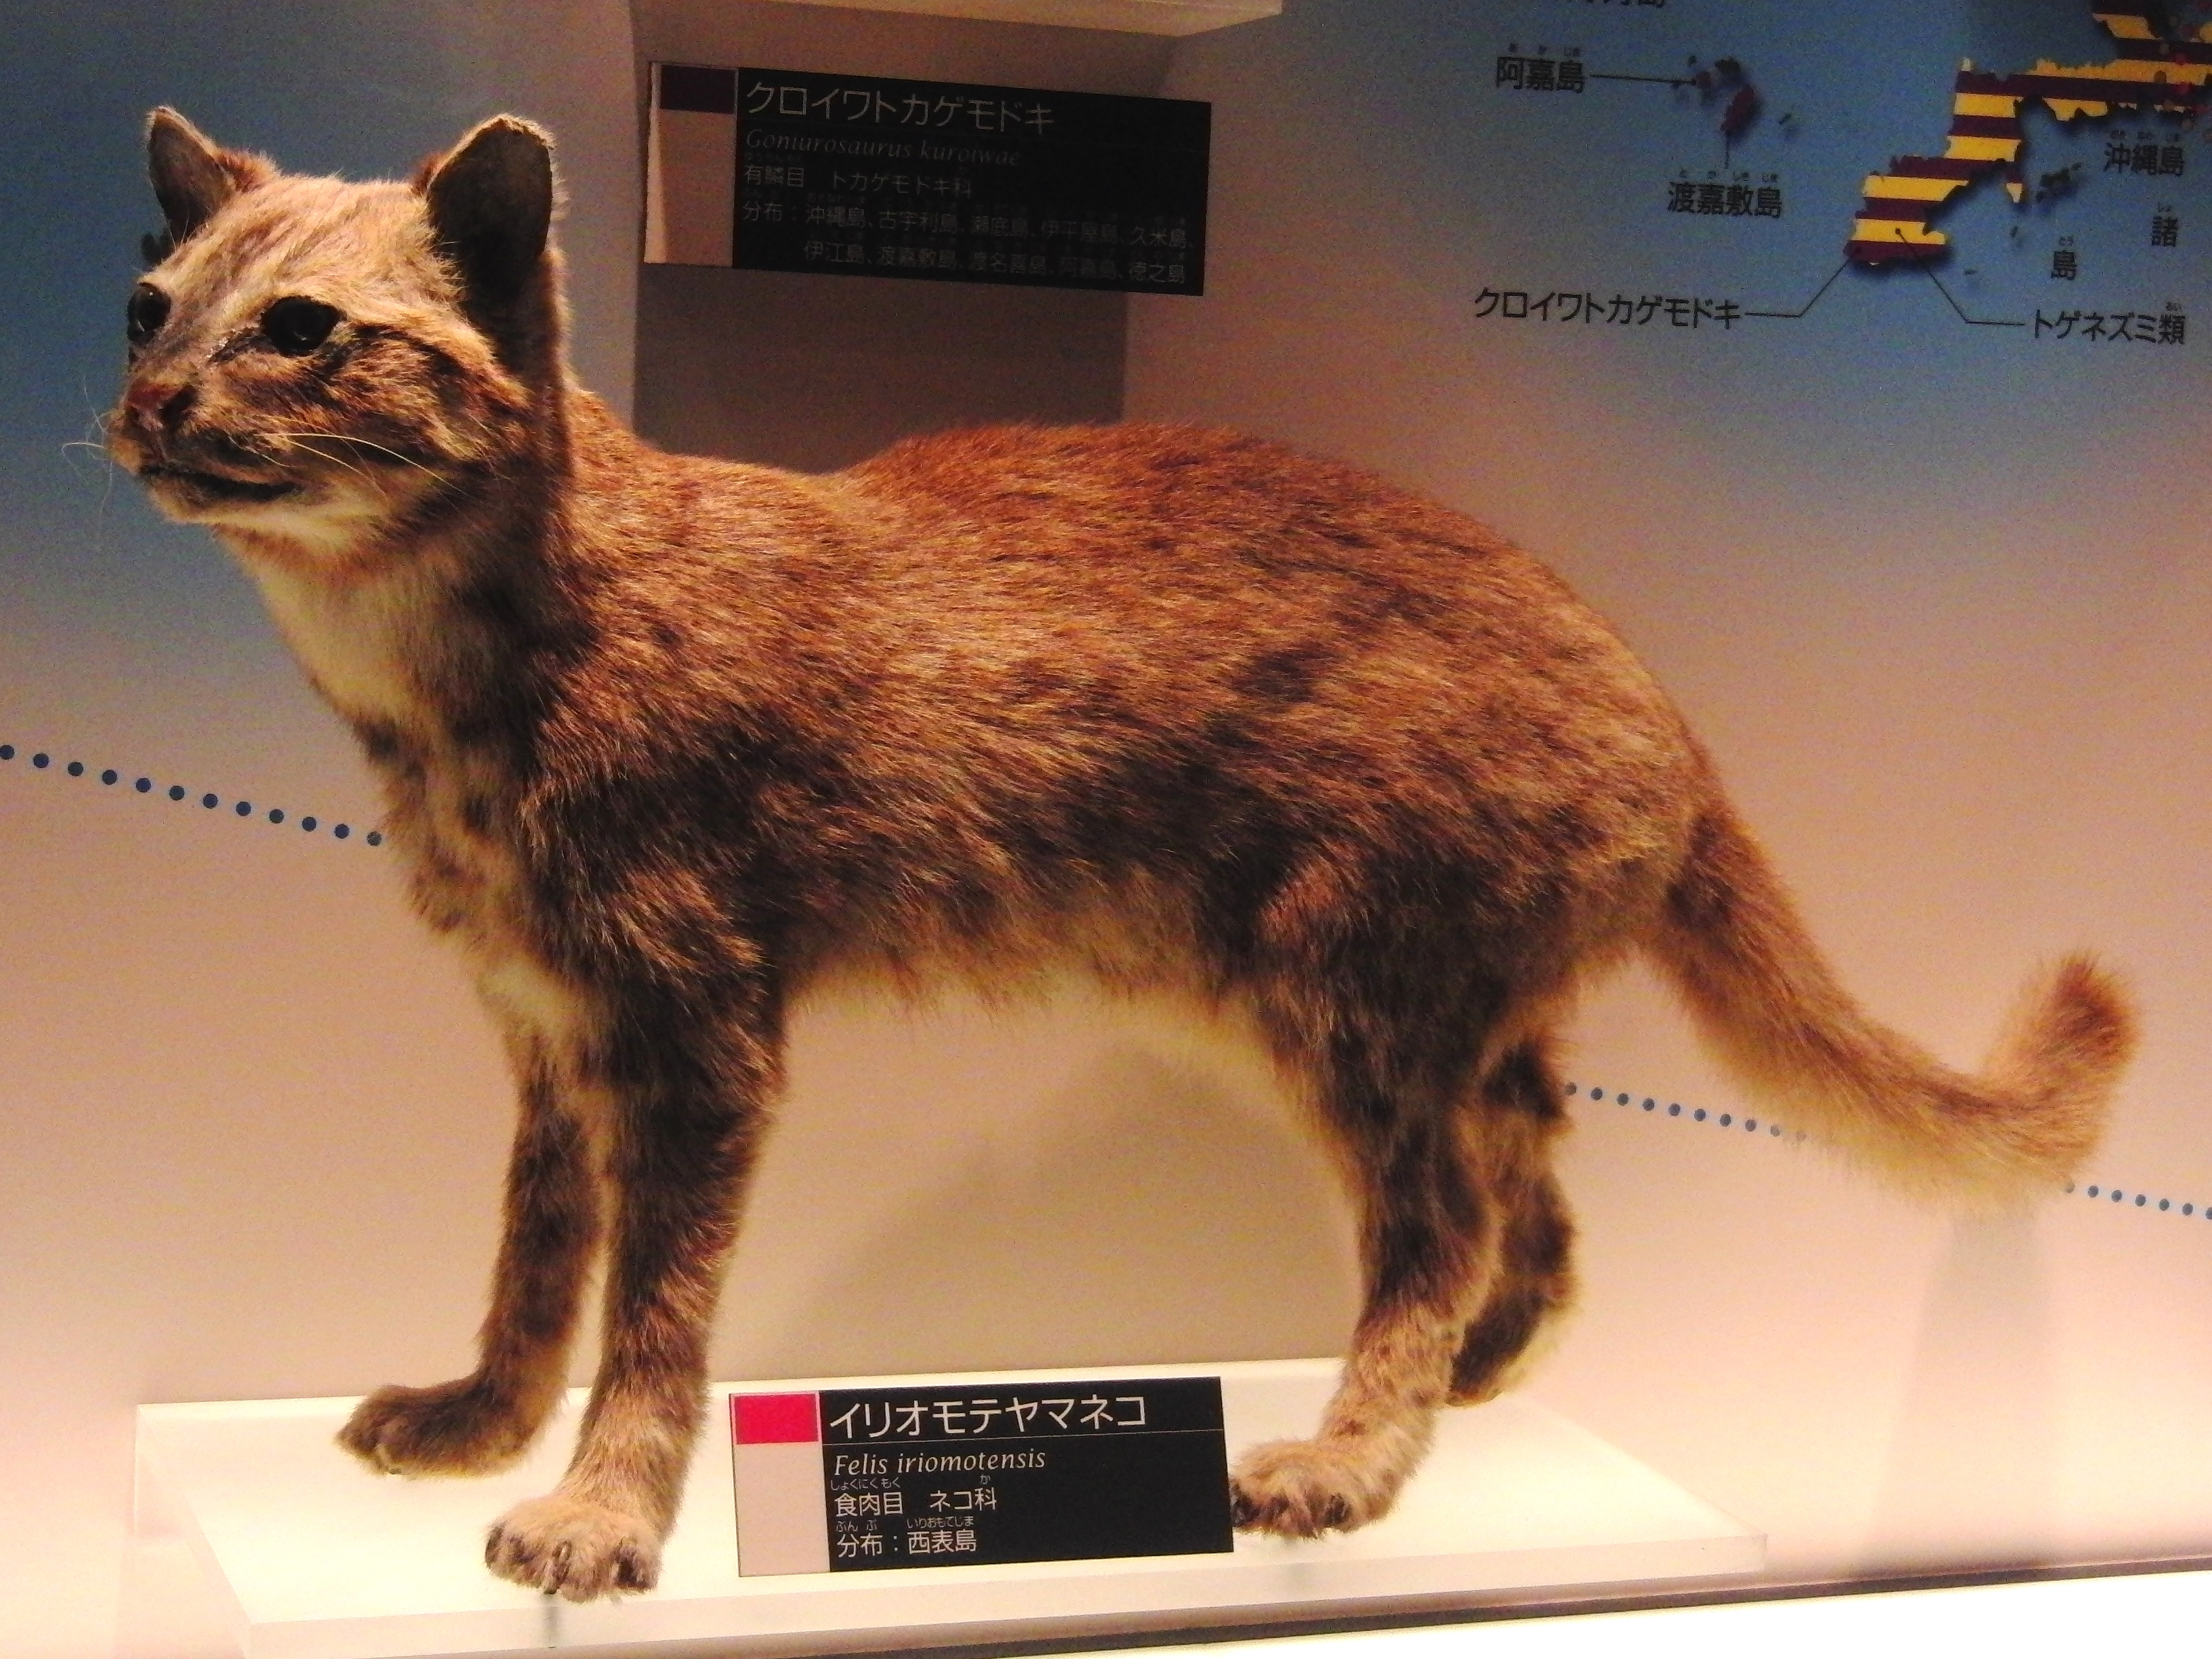 https://upload.wikimedia.org/wikipedia/commons/f/f7/Iriomote_cat_Stuffed_specimen.jpg